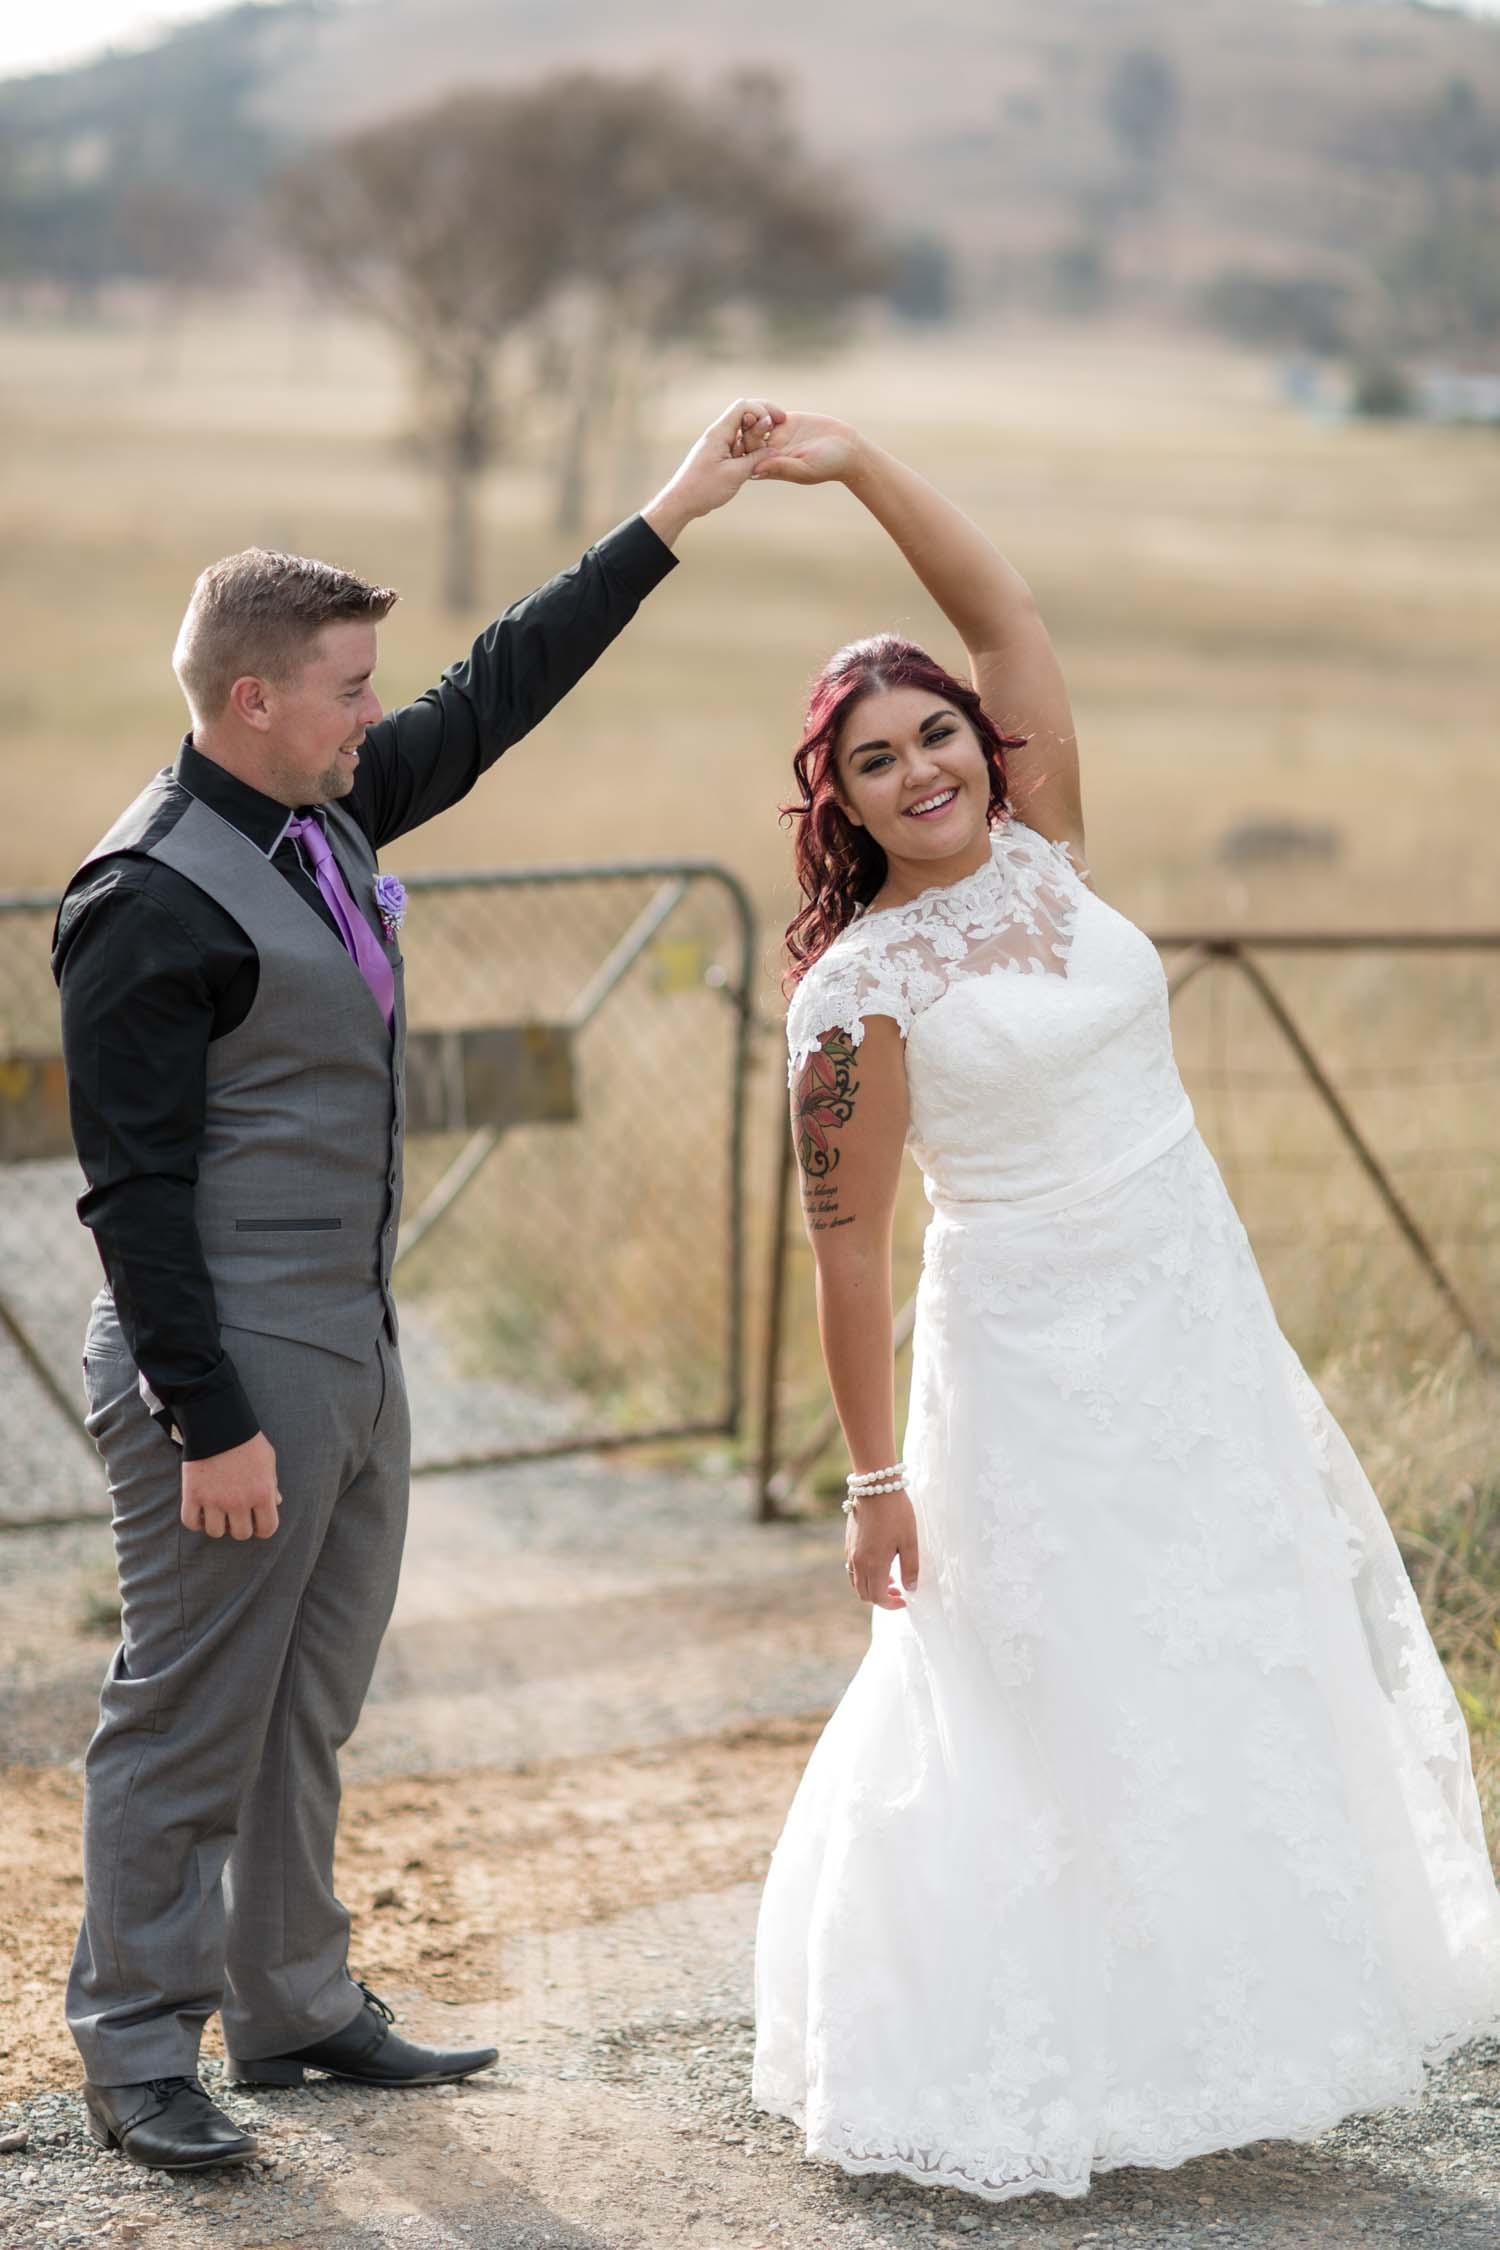 150307-Wedding-TOWN-5-791.jpg